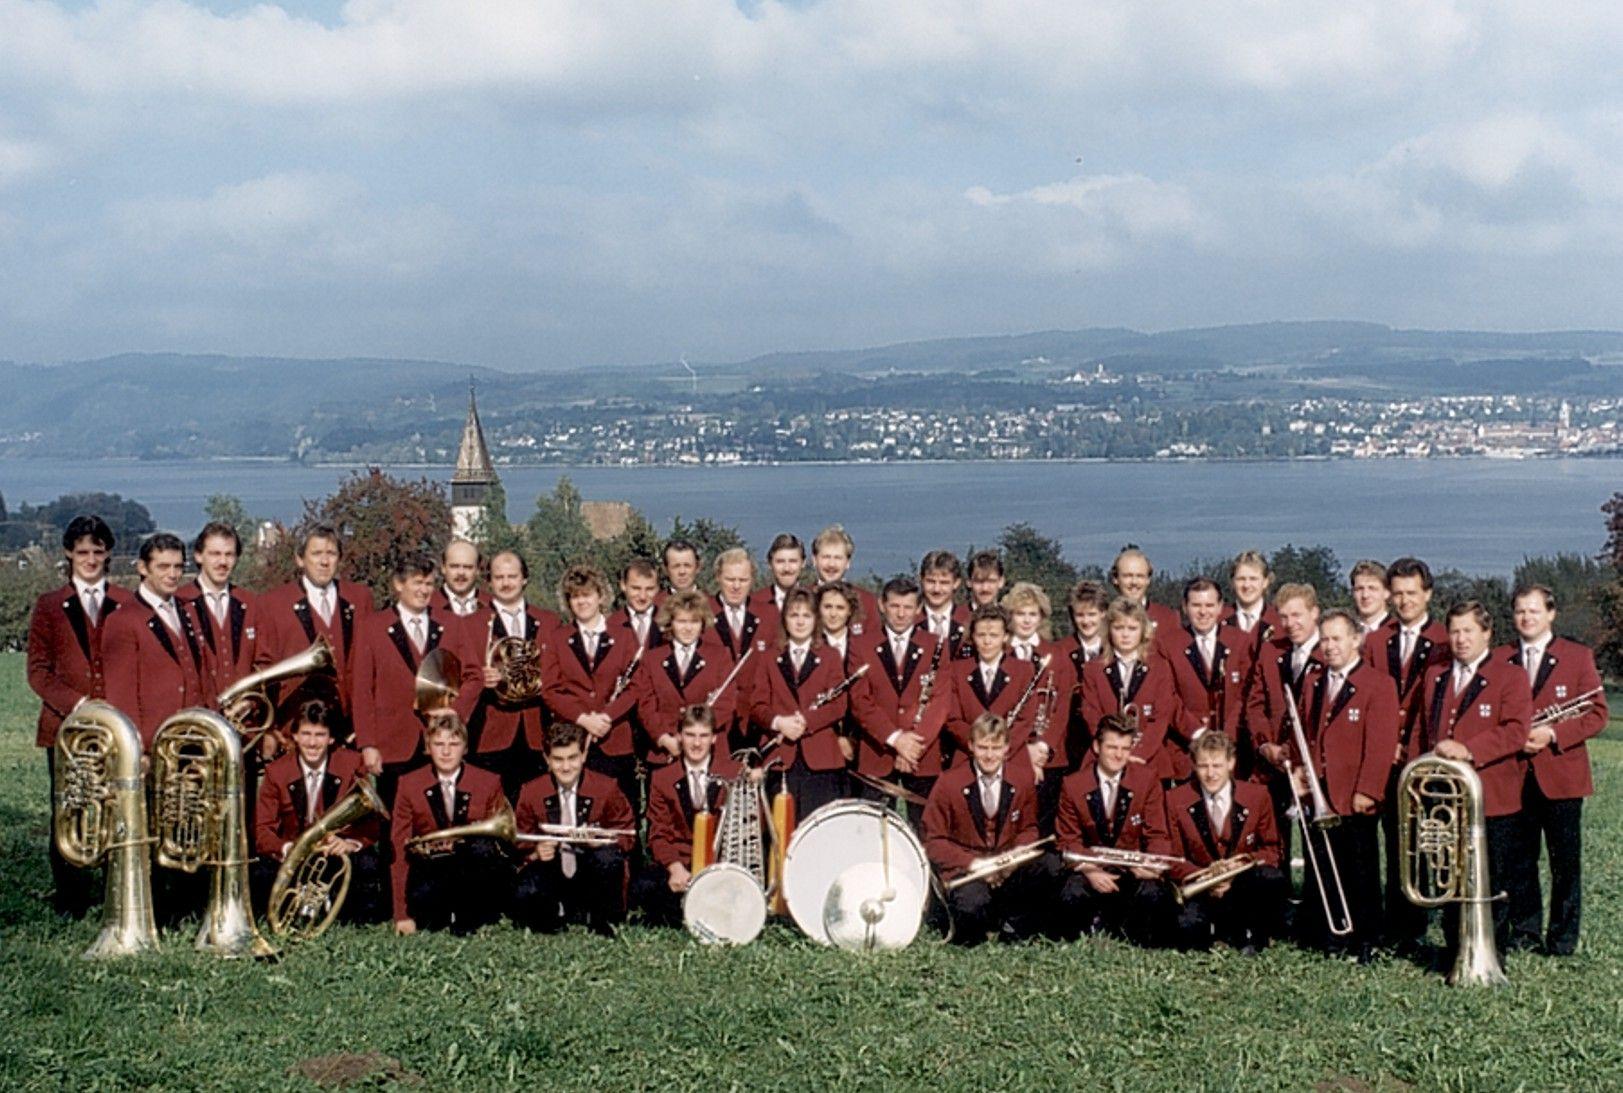 1980 Dritte Uniform